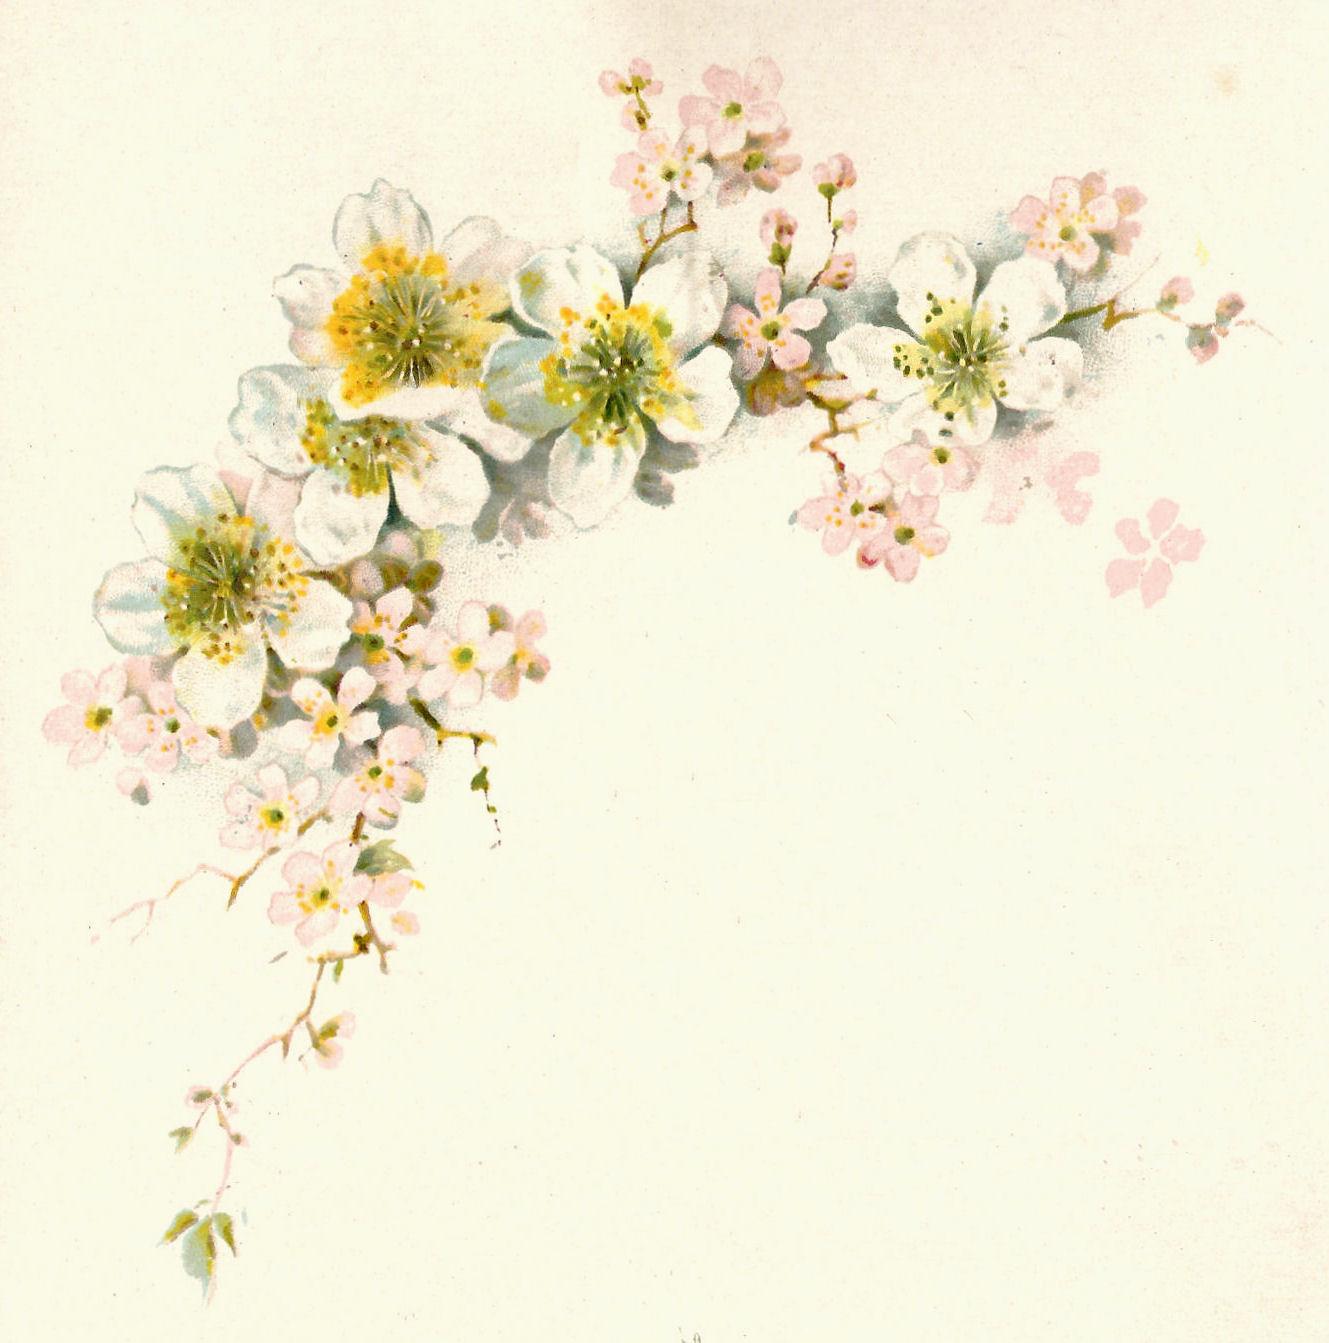 Antique Images: Free Flower Graphic: Vintage Dogwood Flower Clip Art.